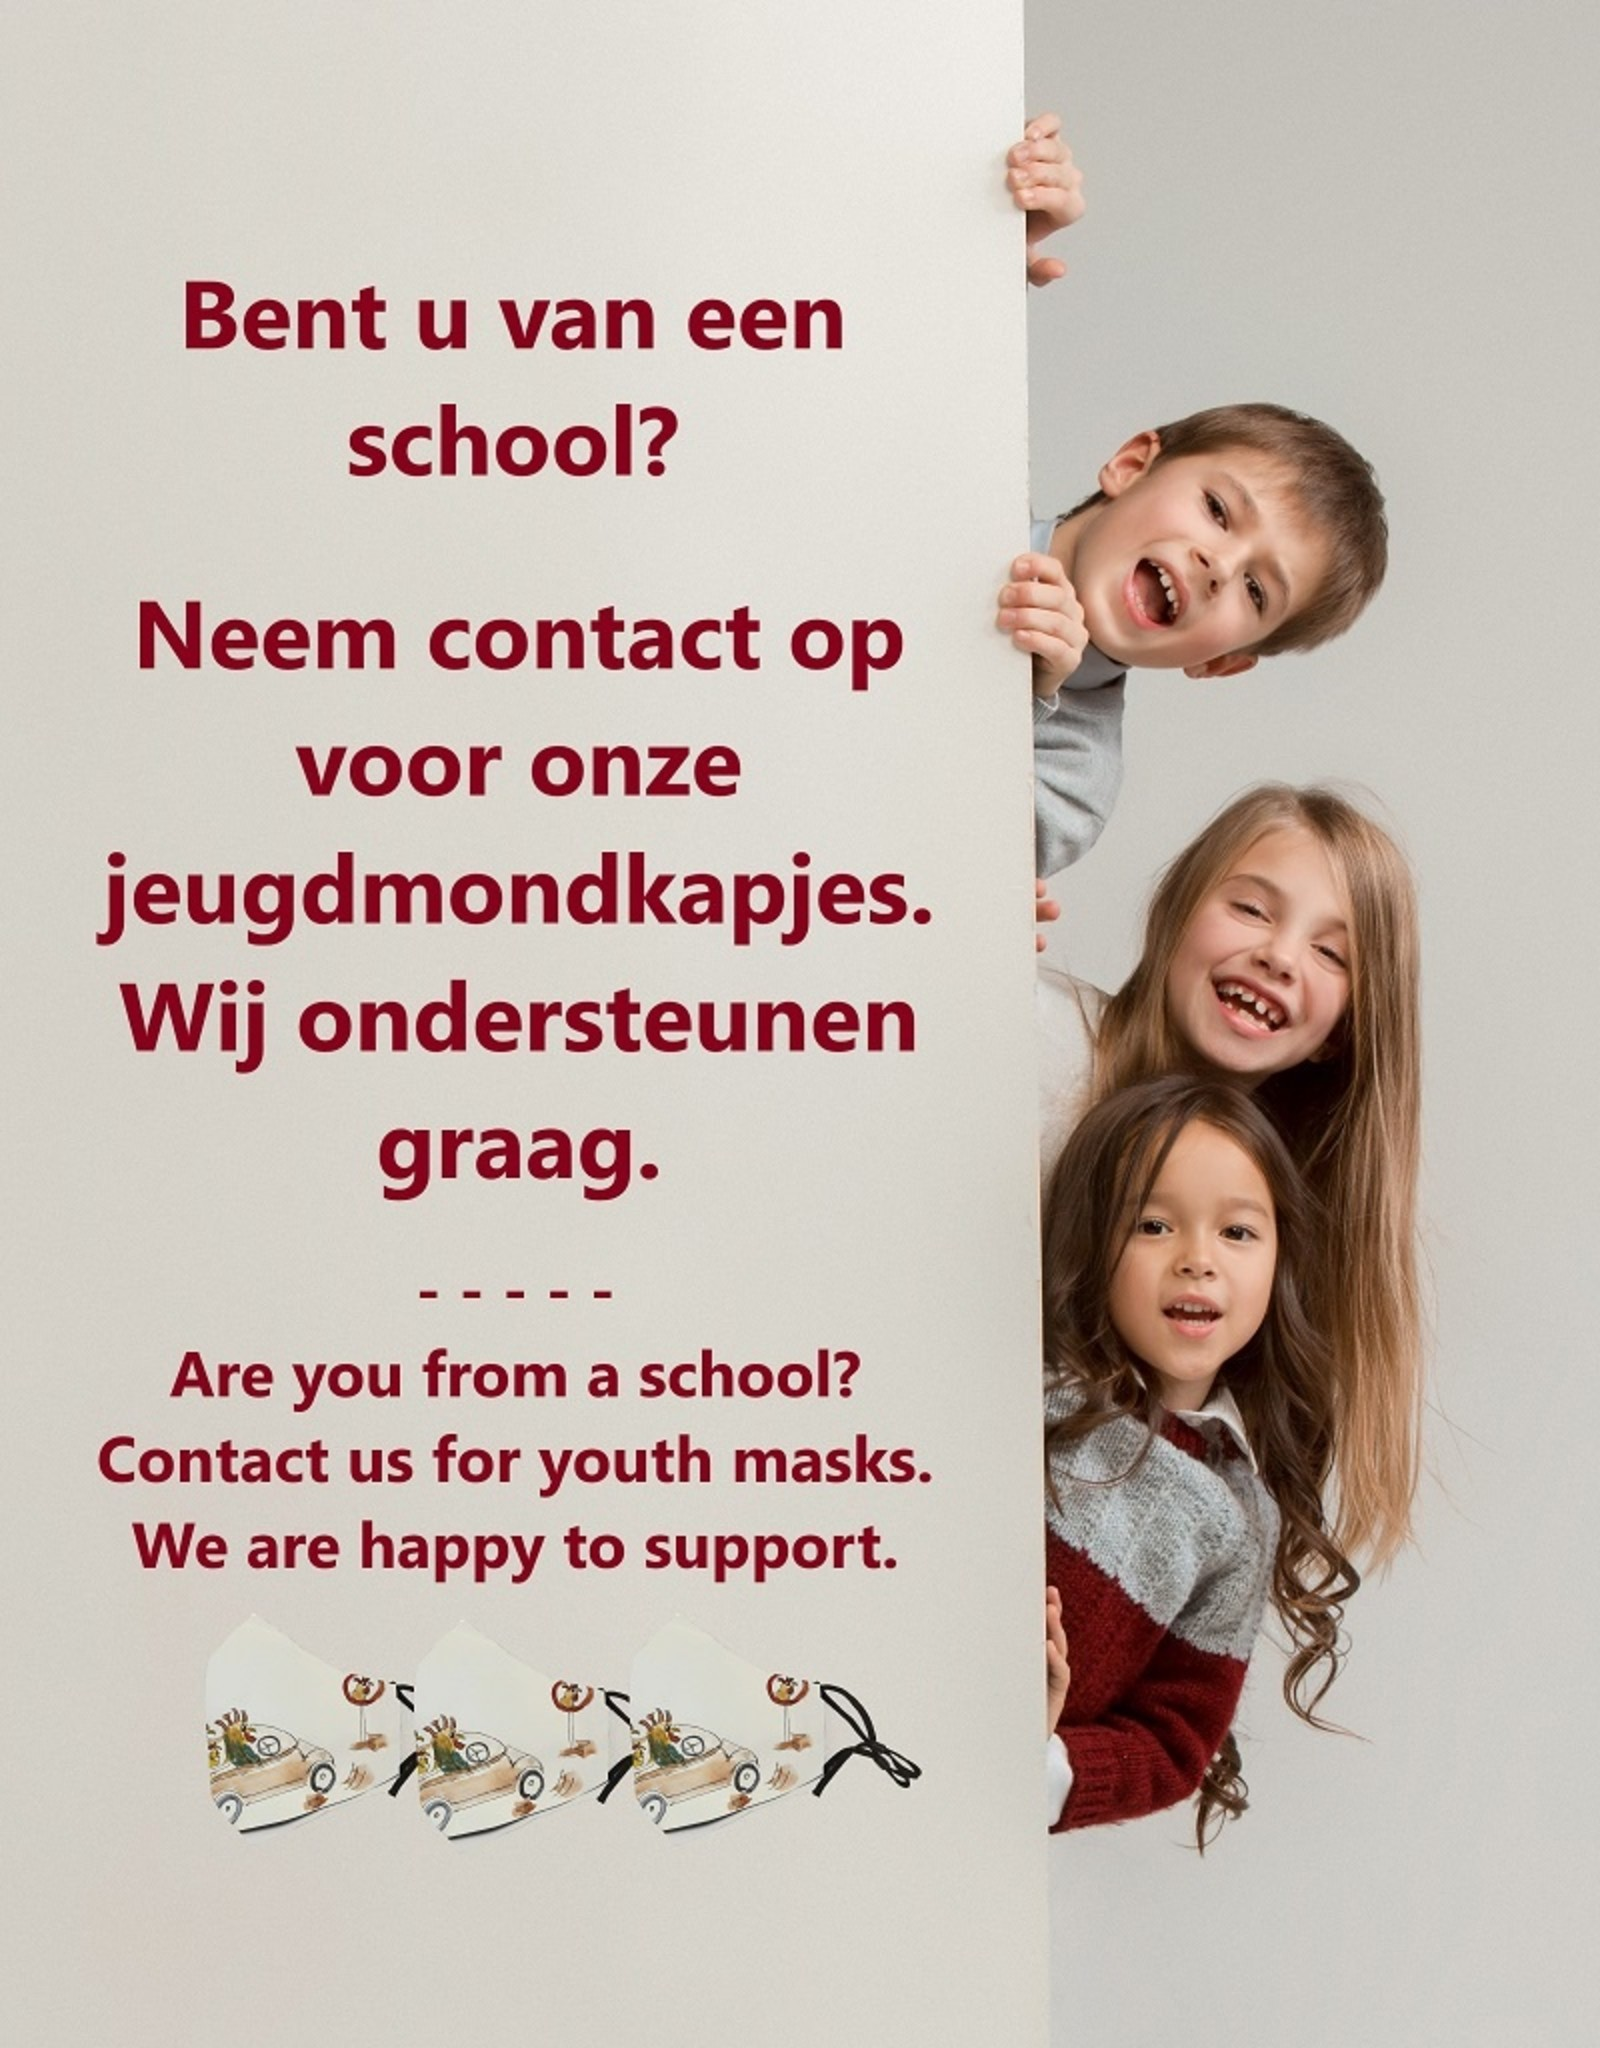 Maskie Youth masks for schools